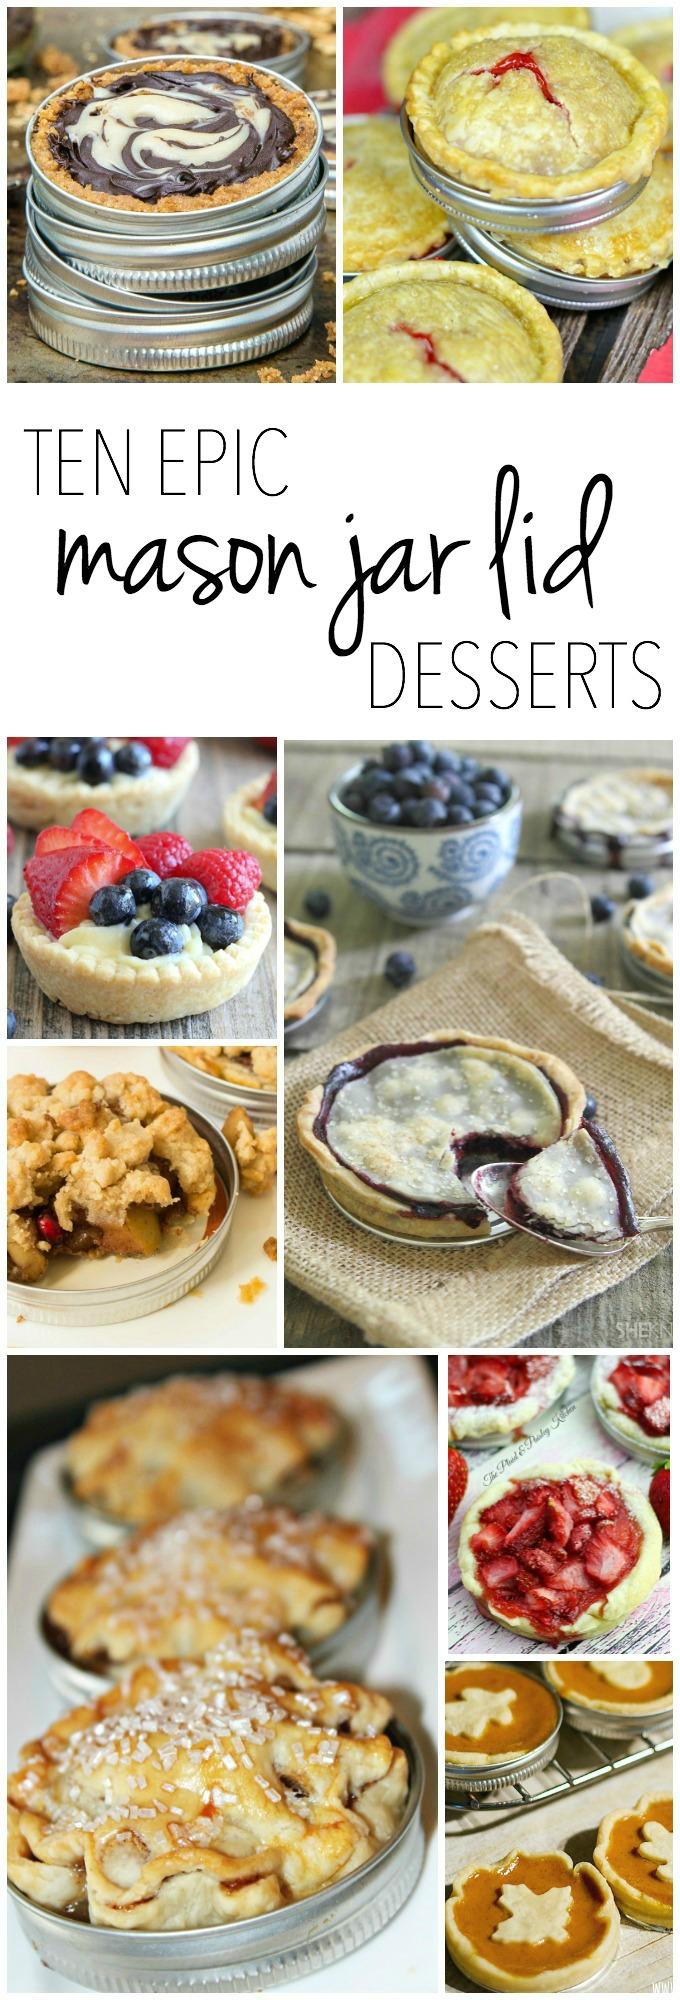 Desserts Baked in... MASON JAR LIDS